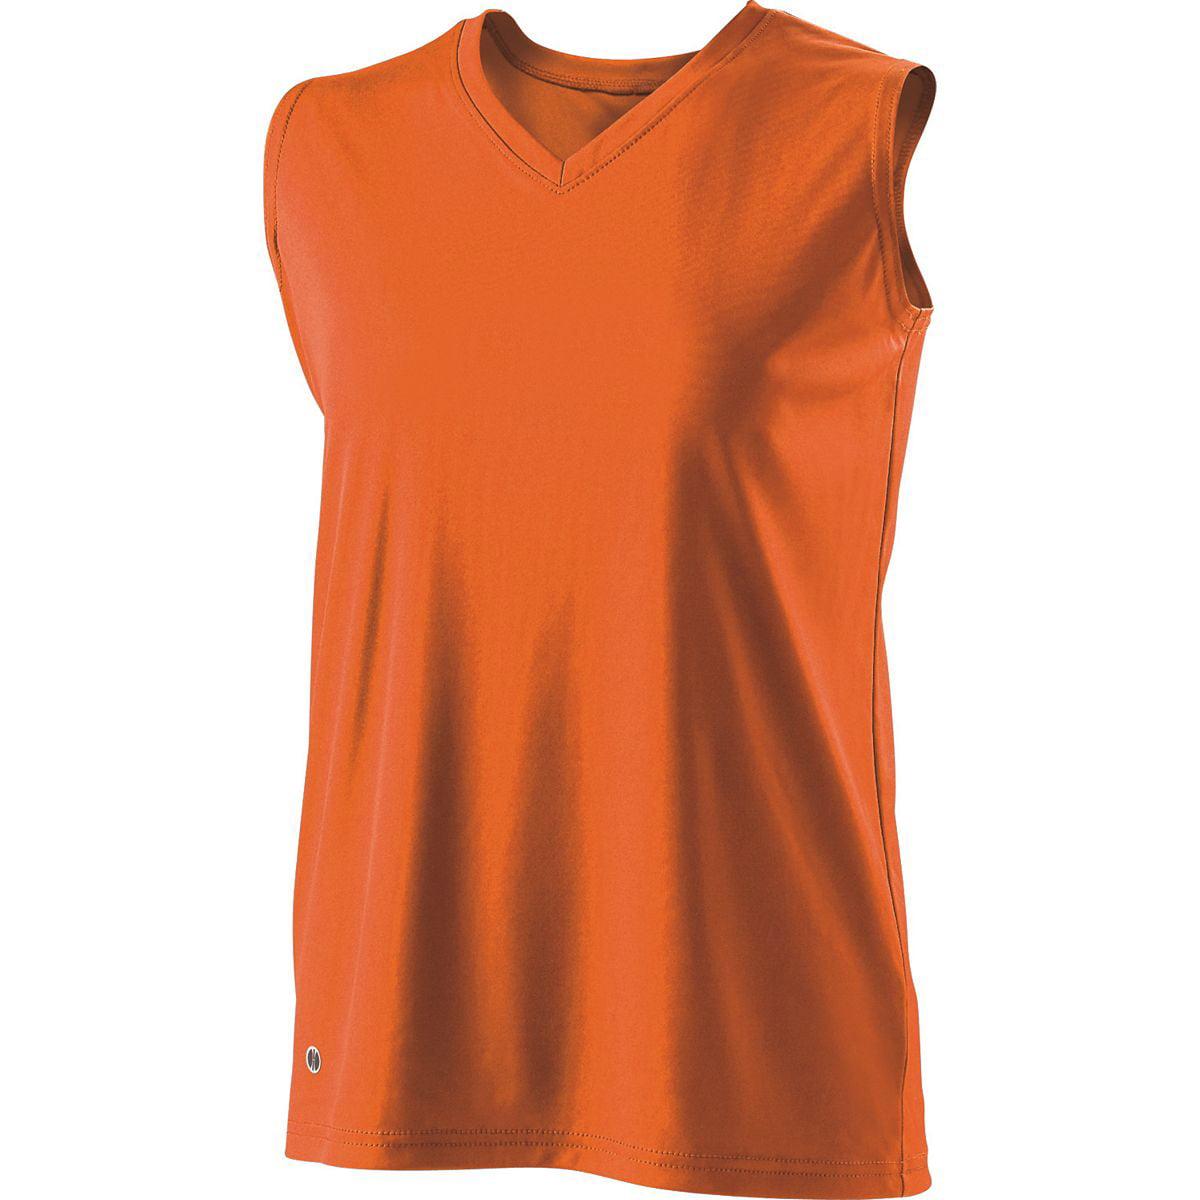 Holloway Girls Flex Sleeveless Tee Orange S - image 1 de 1